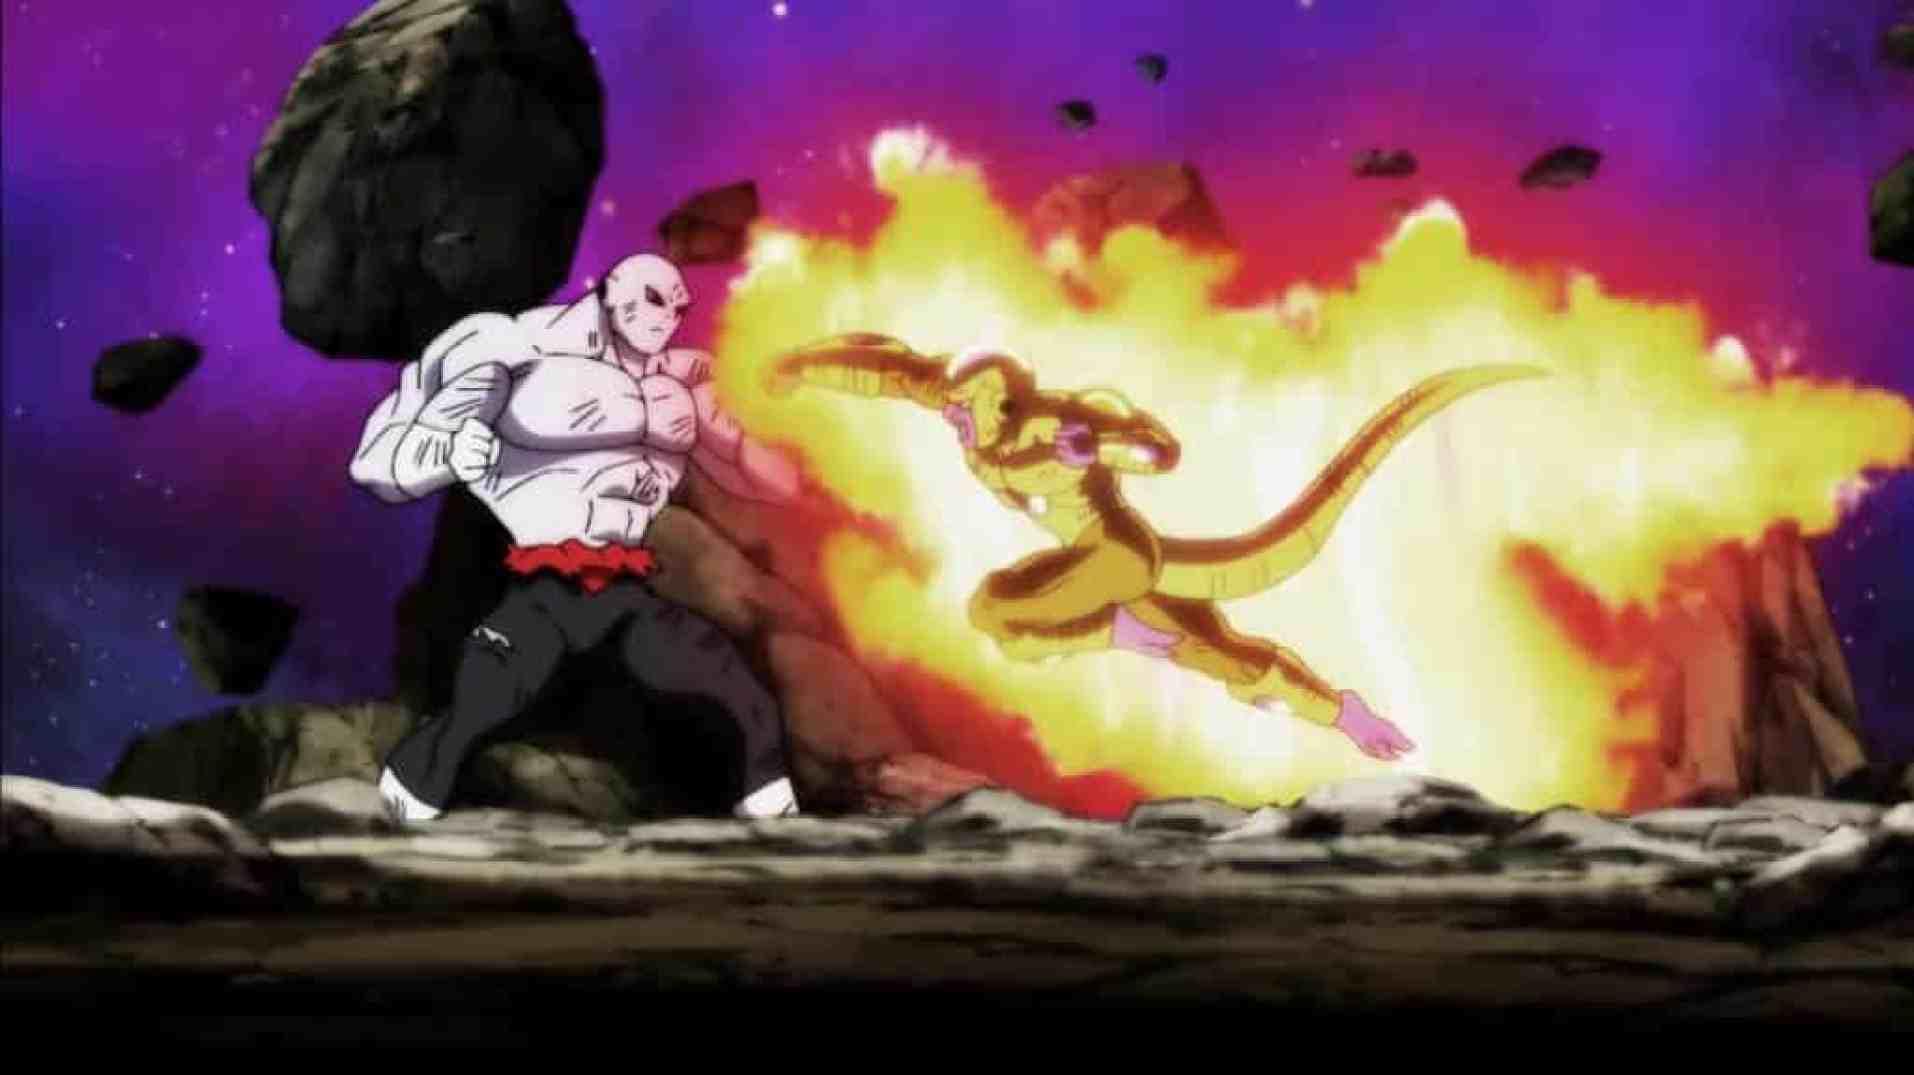 Frieza vs Jiren - Dragon Ball Super Episode 131 Review